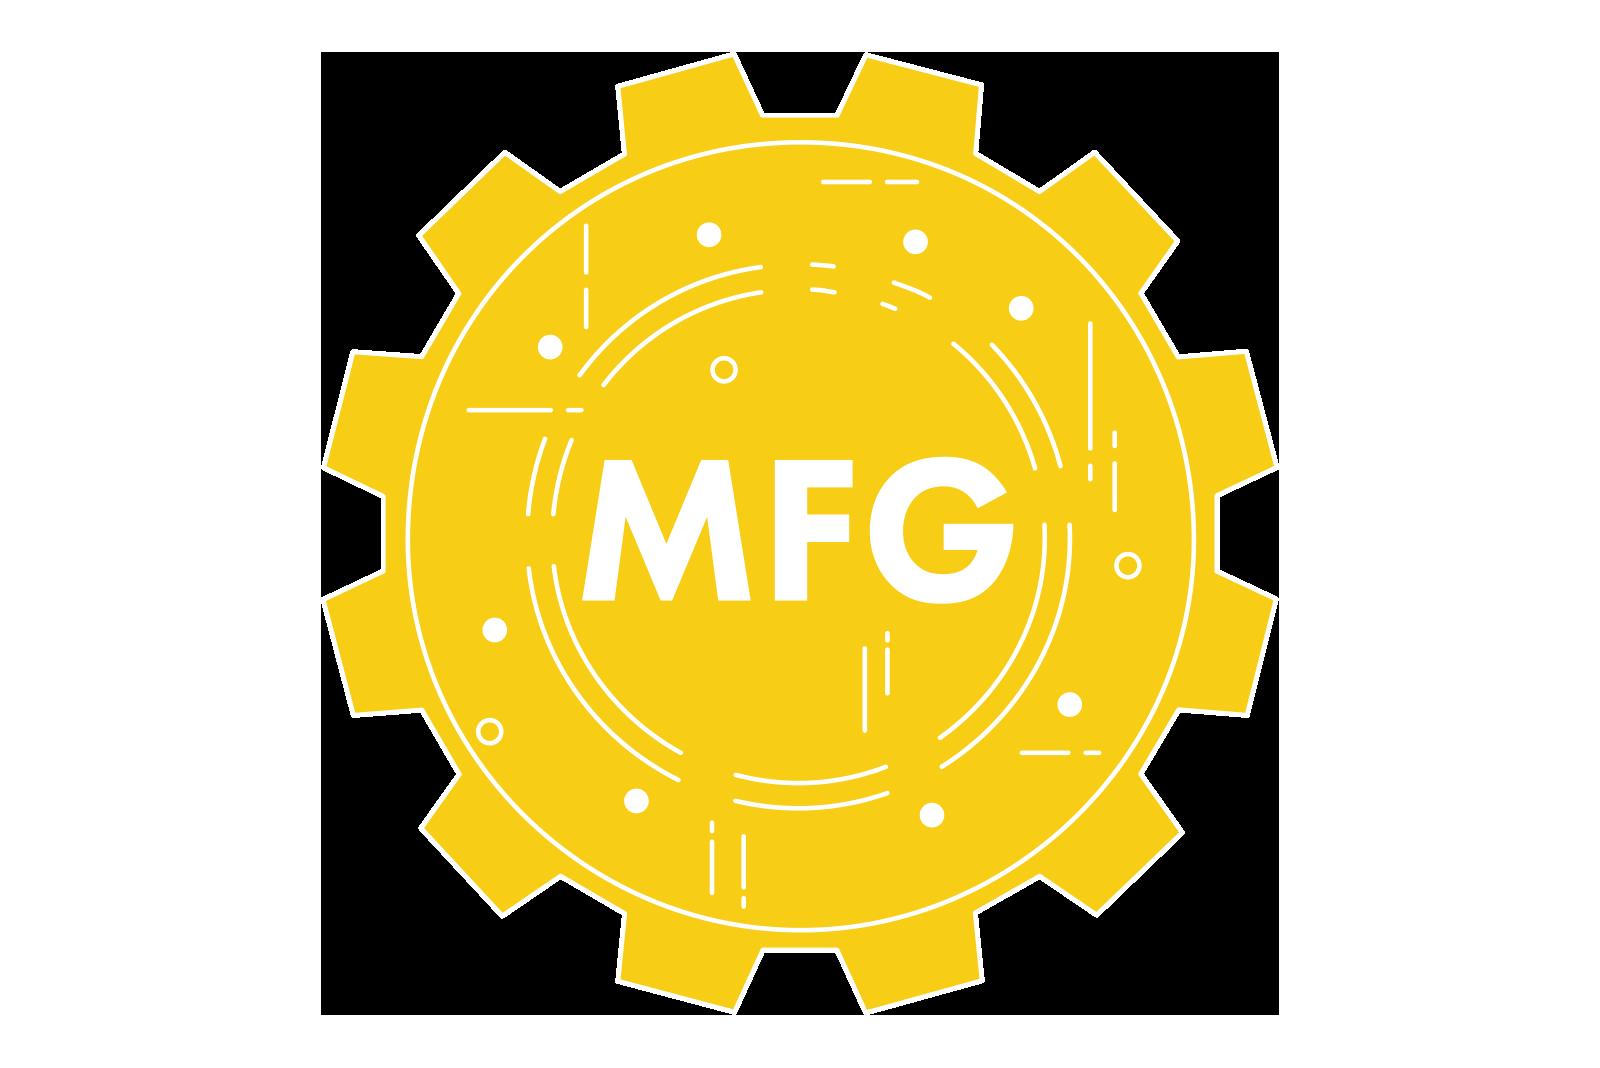 SyncFab (MFG) coin